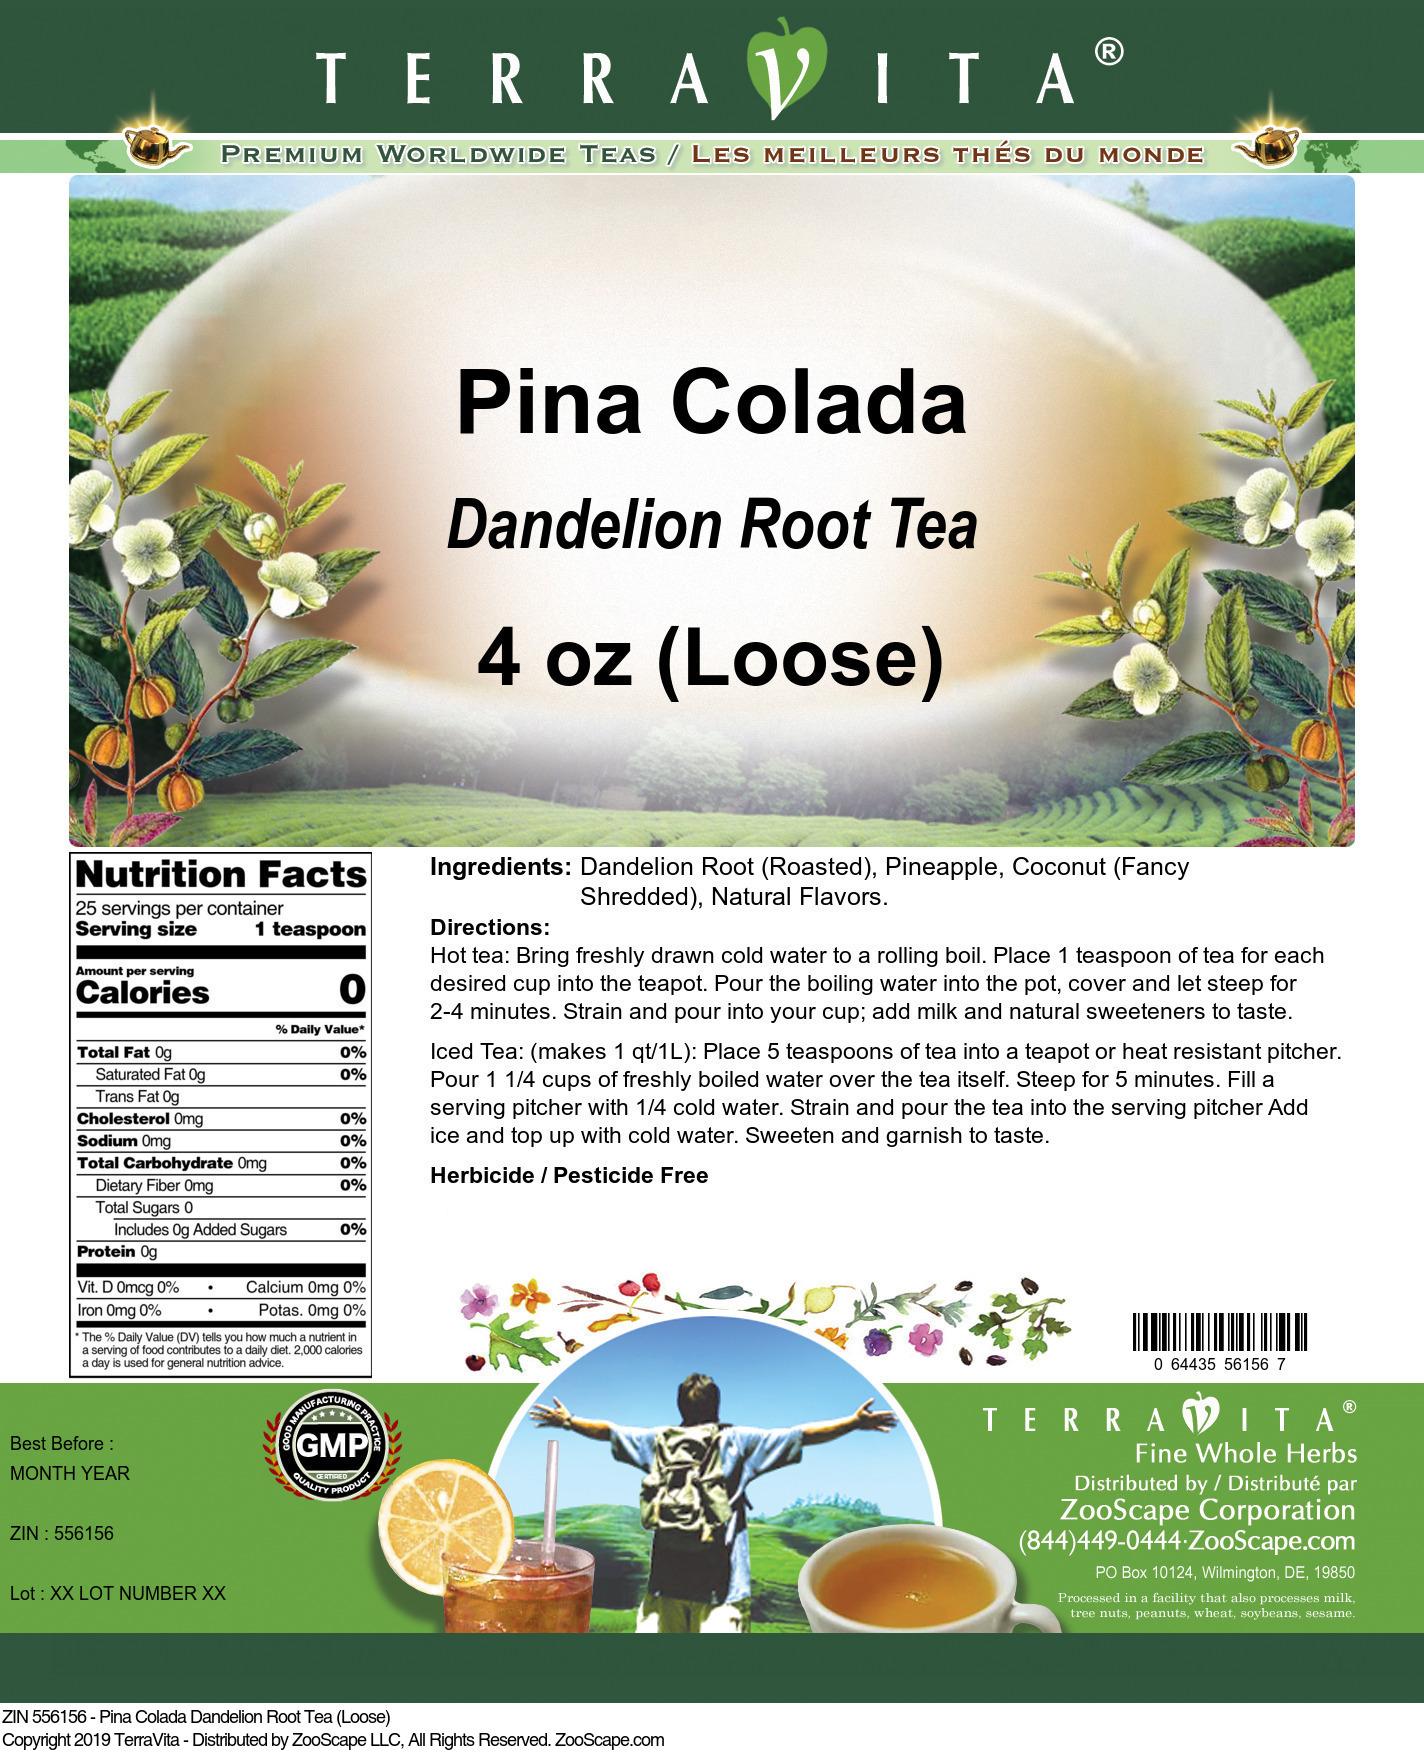 Pina Colada Dandelion Root Tea (Loose)